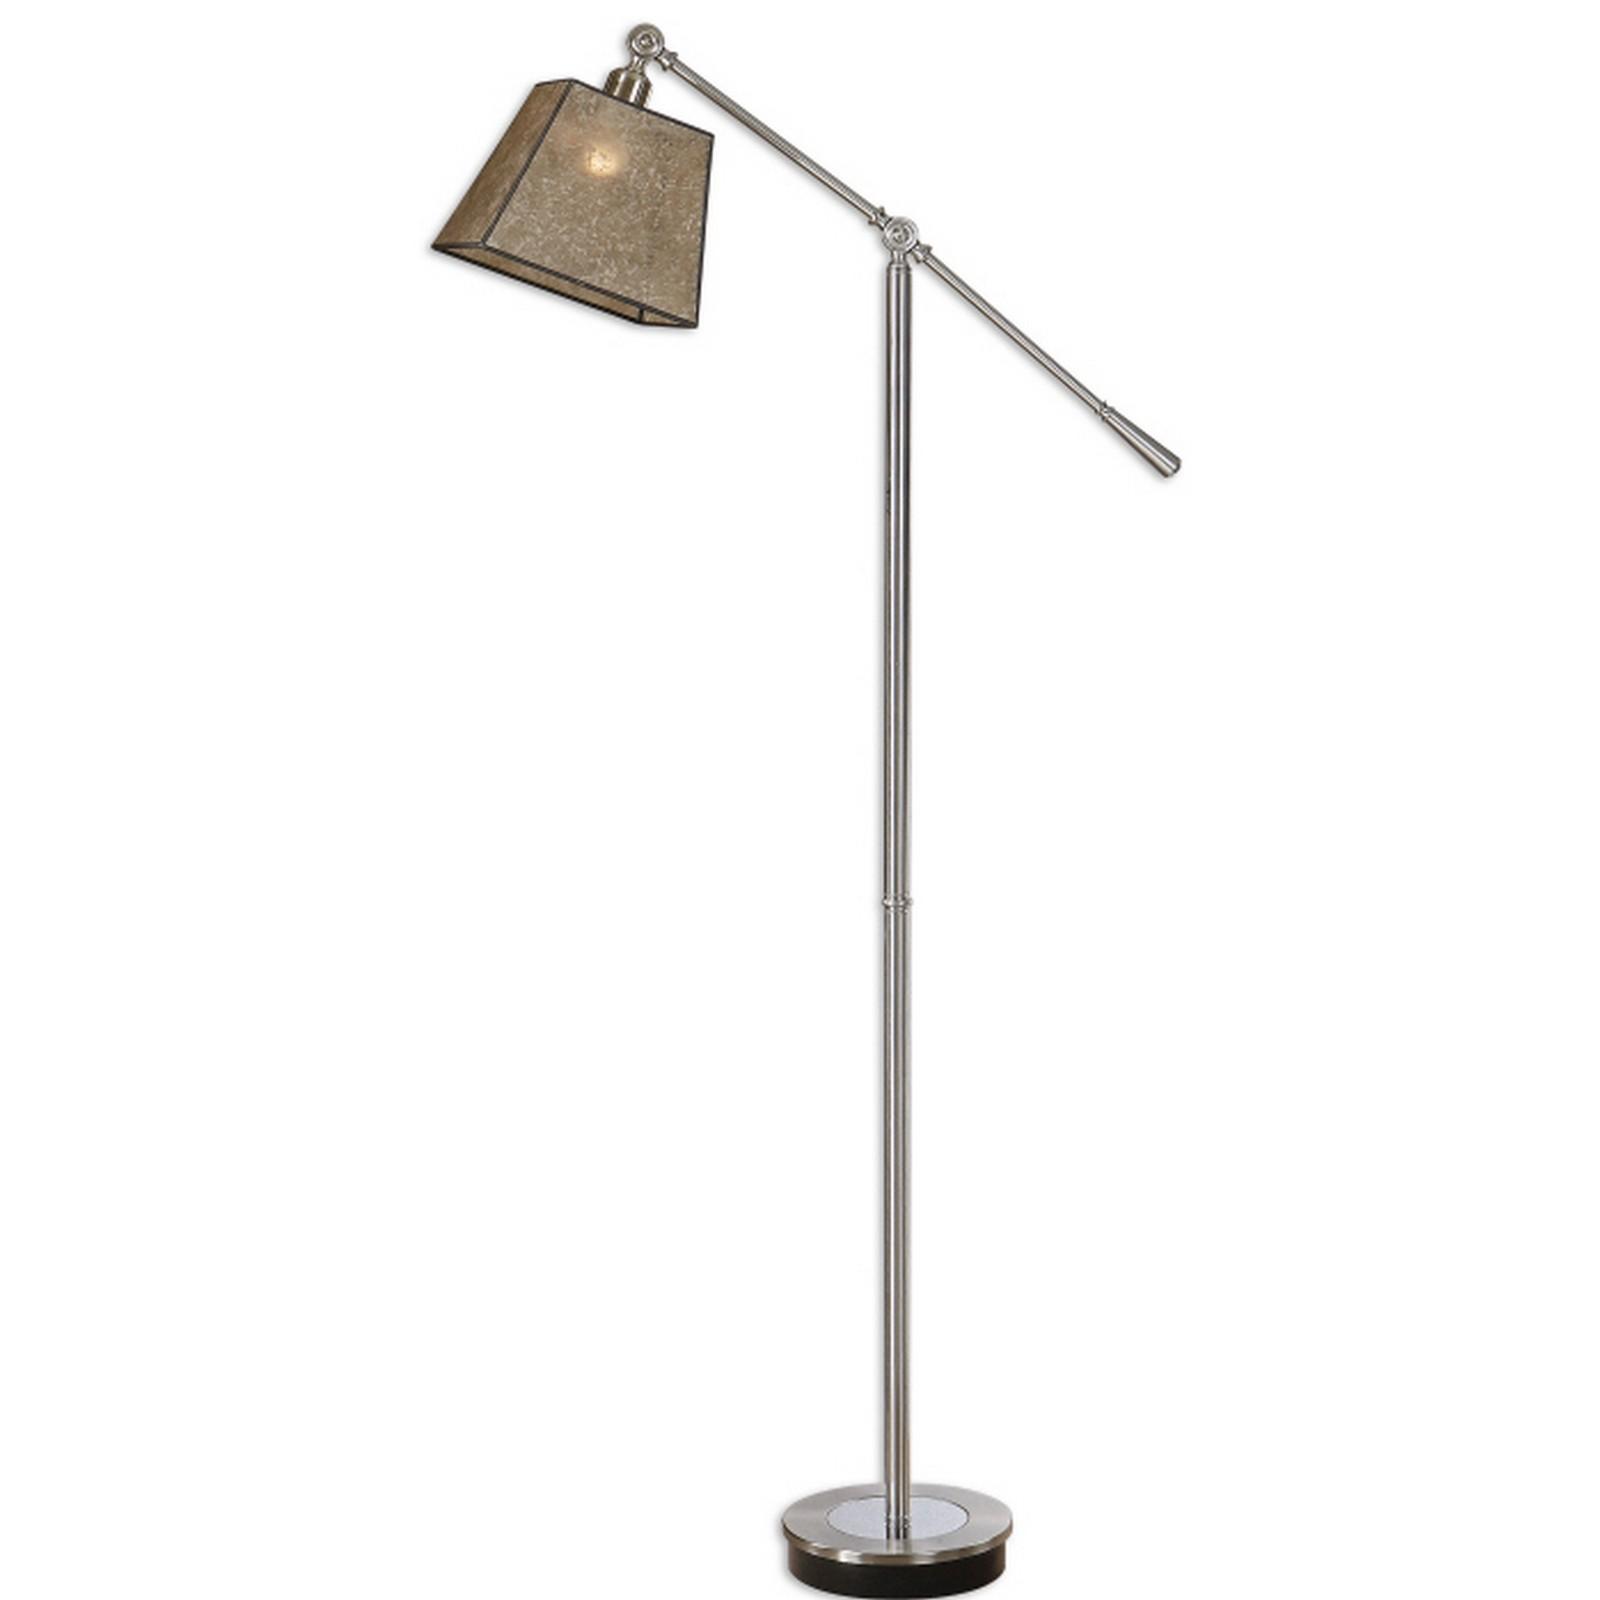 uttermost biella chrome swing arm floor lamp ebay. Black Bedroom Furniture Sets. Home Design Ideas